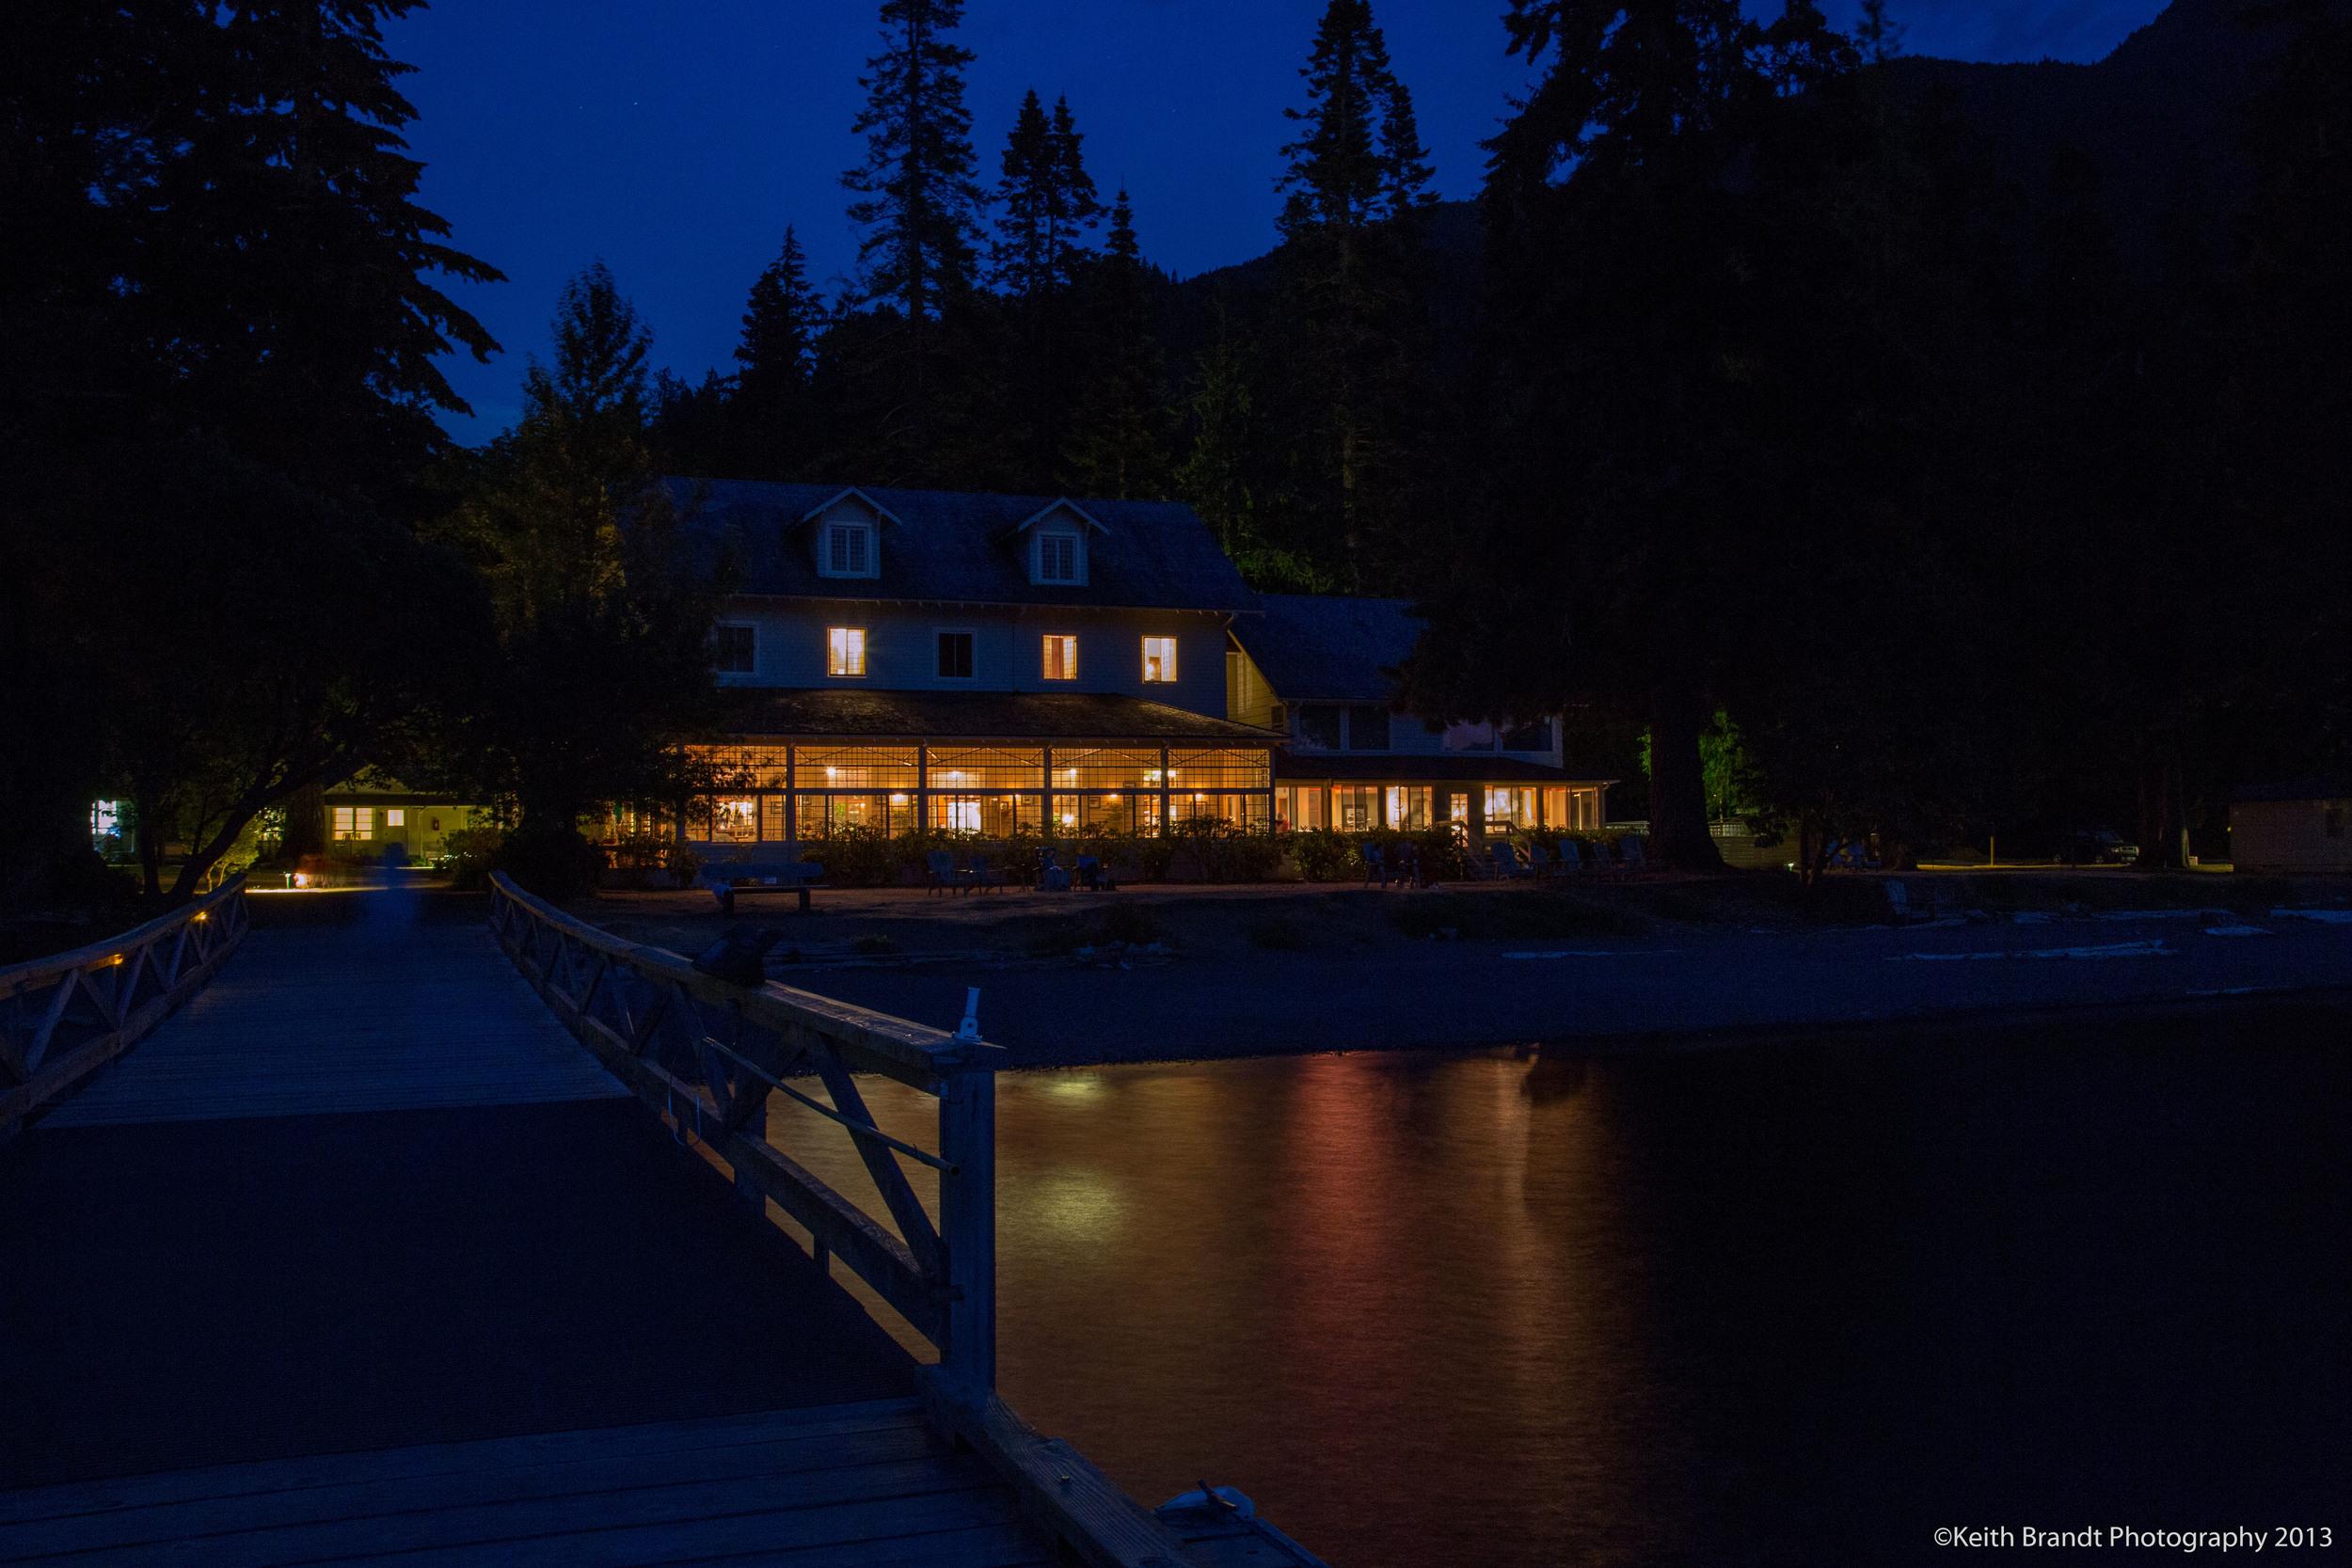 Lake Crescent Lodge at night